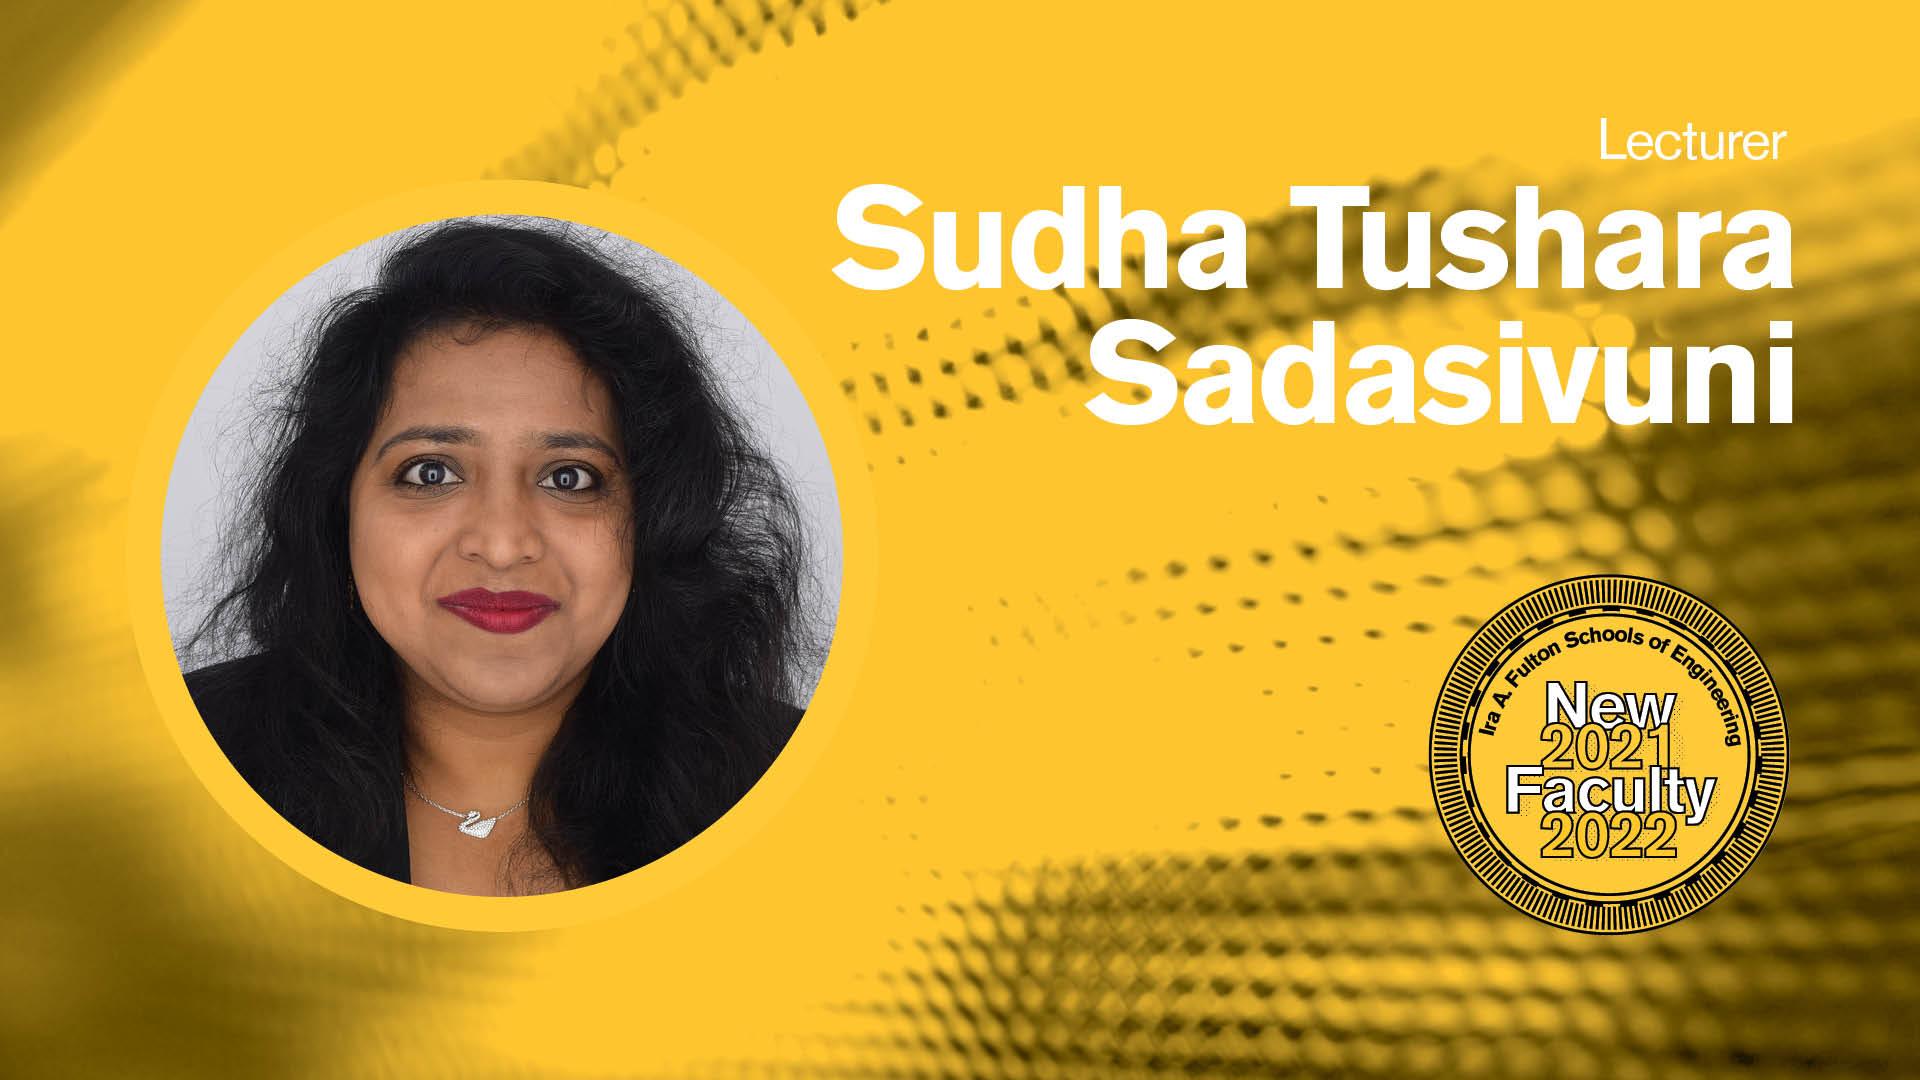 Tushara Sadasivuni